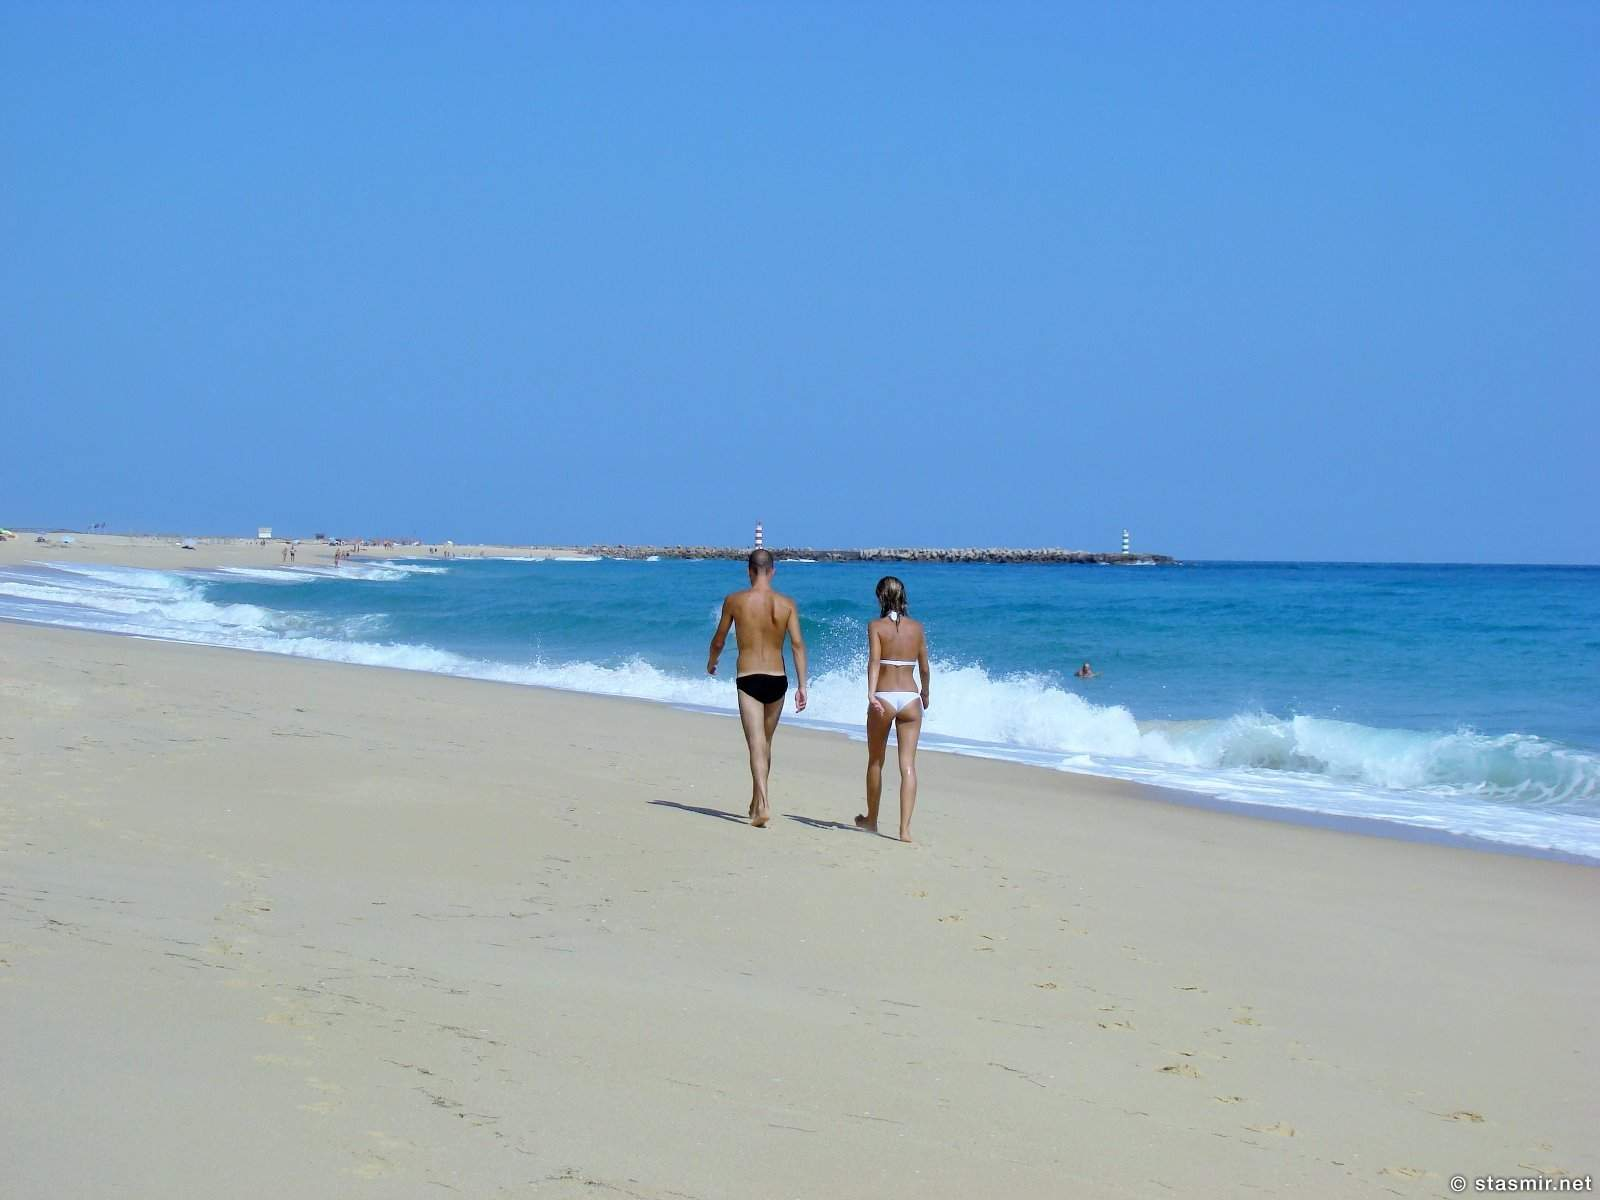 пляжи Ria Formosa или Риа-Формоза, Ilha Deserta, Algarve, пляж в Алгарве, фото Стасмир, Photo Stasmir